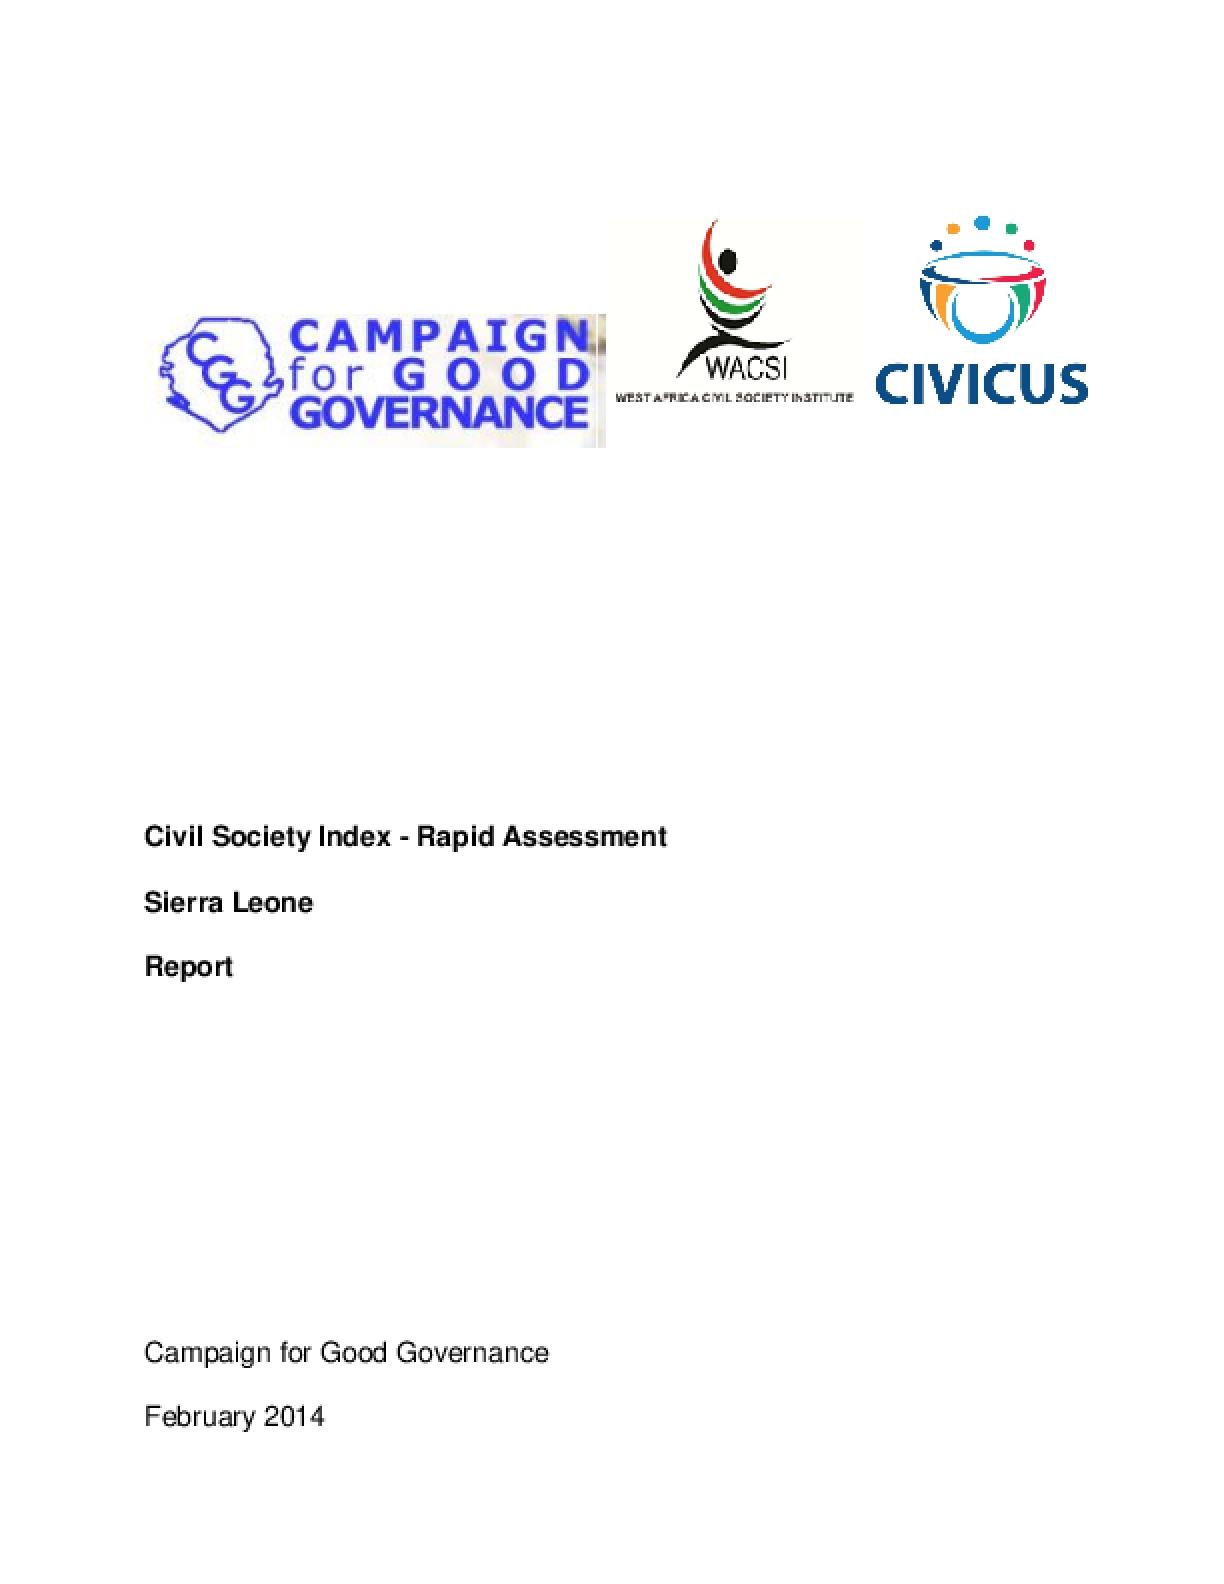 Civil Society Index-Rapid Assessment (CSI-RA): Sierra Leone